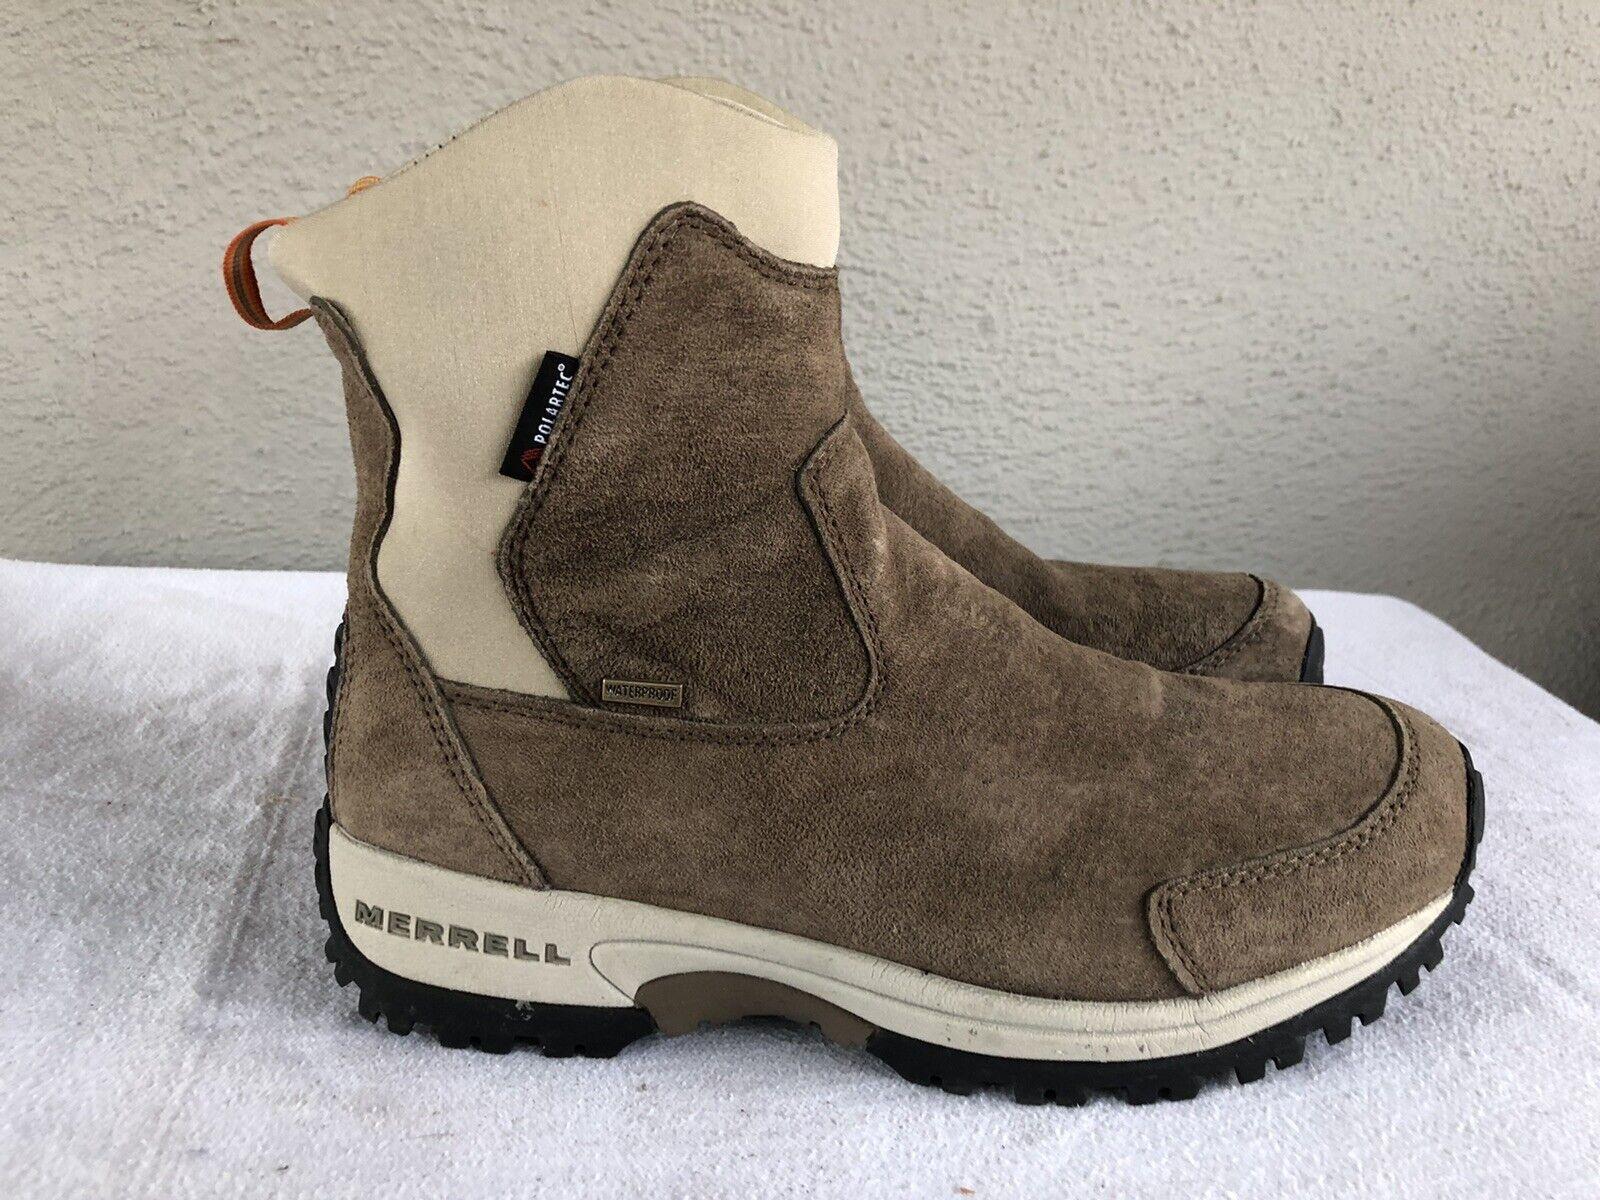 Menta Mujeres Merrell Tundra US 9.5 Oscuro Taupe botas De Gamuza POLARTEC THINSULATE B